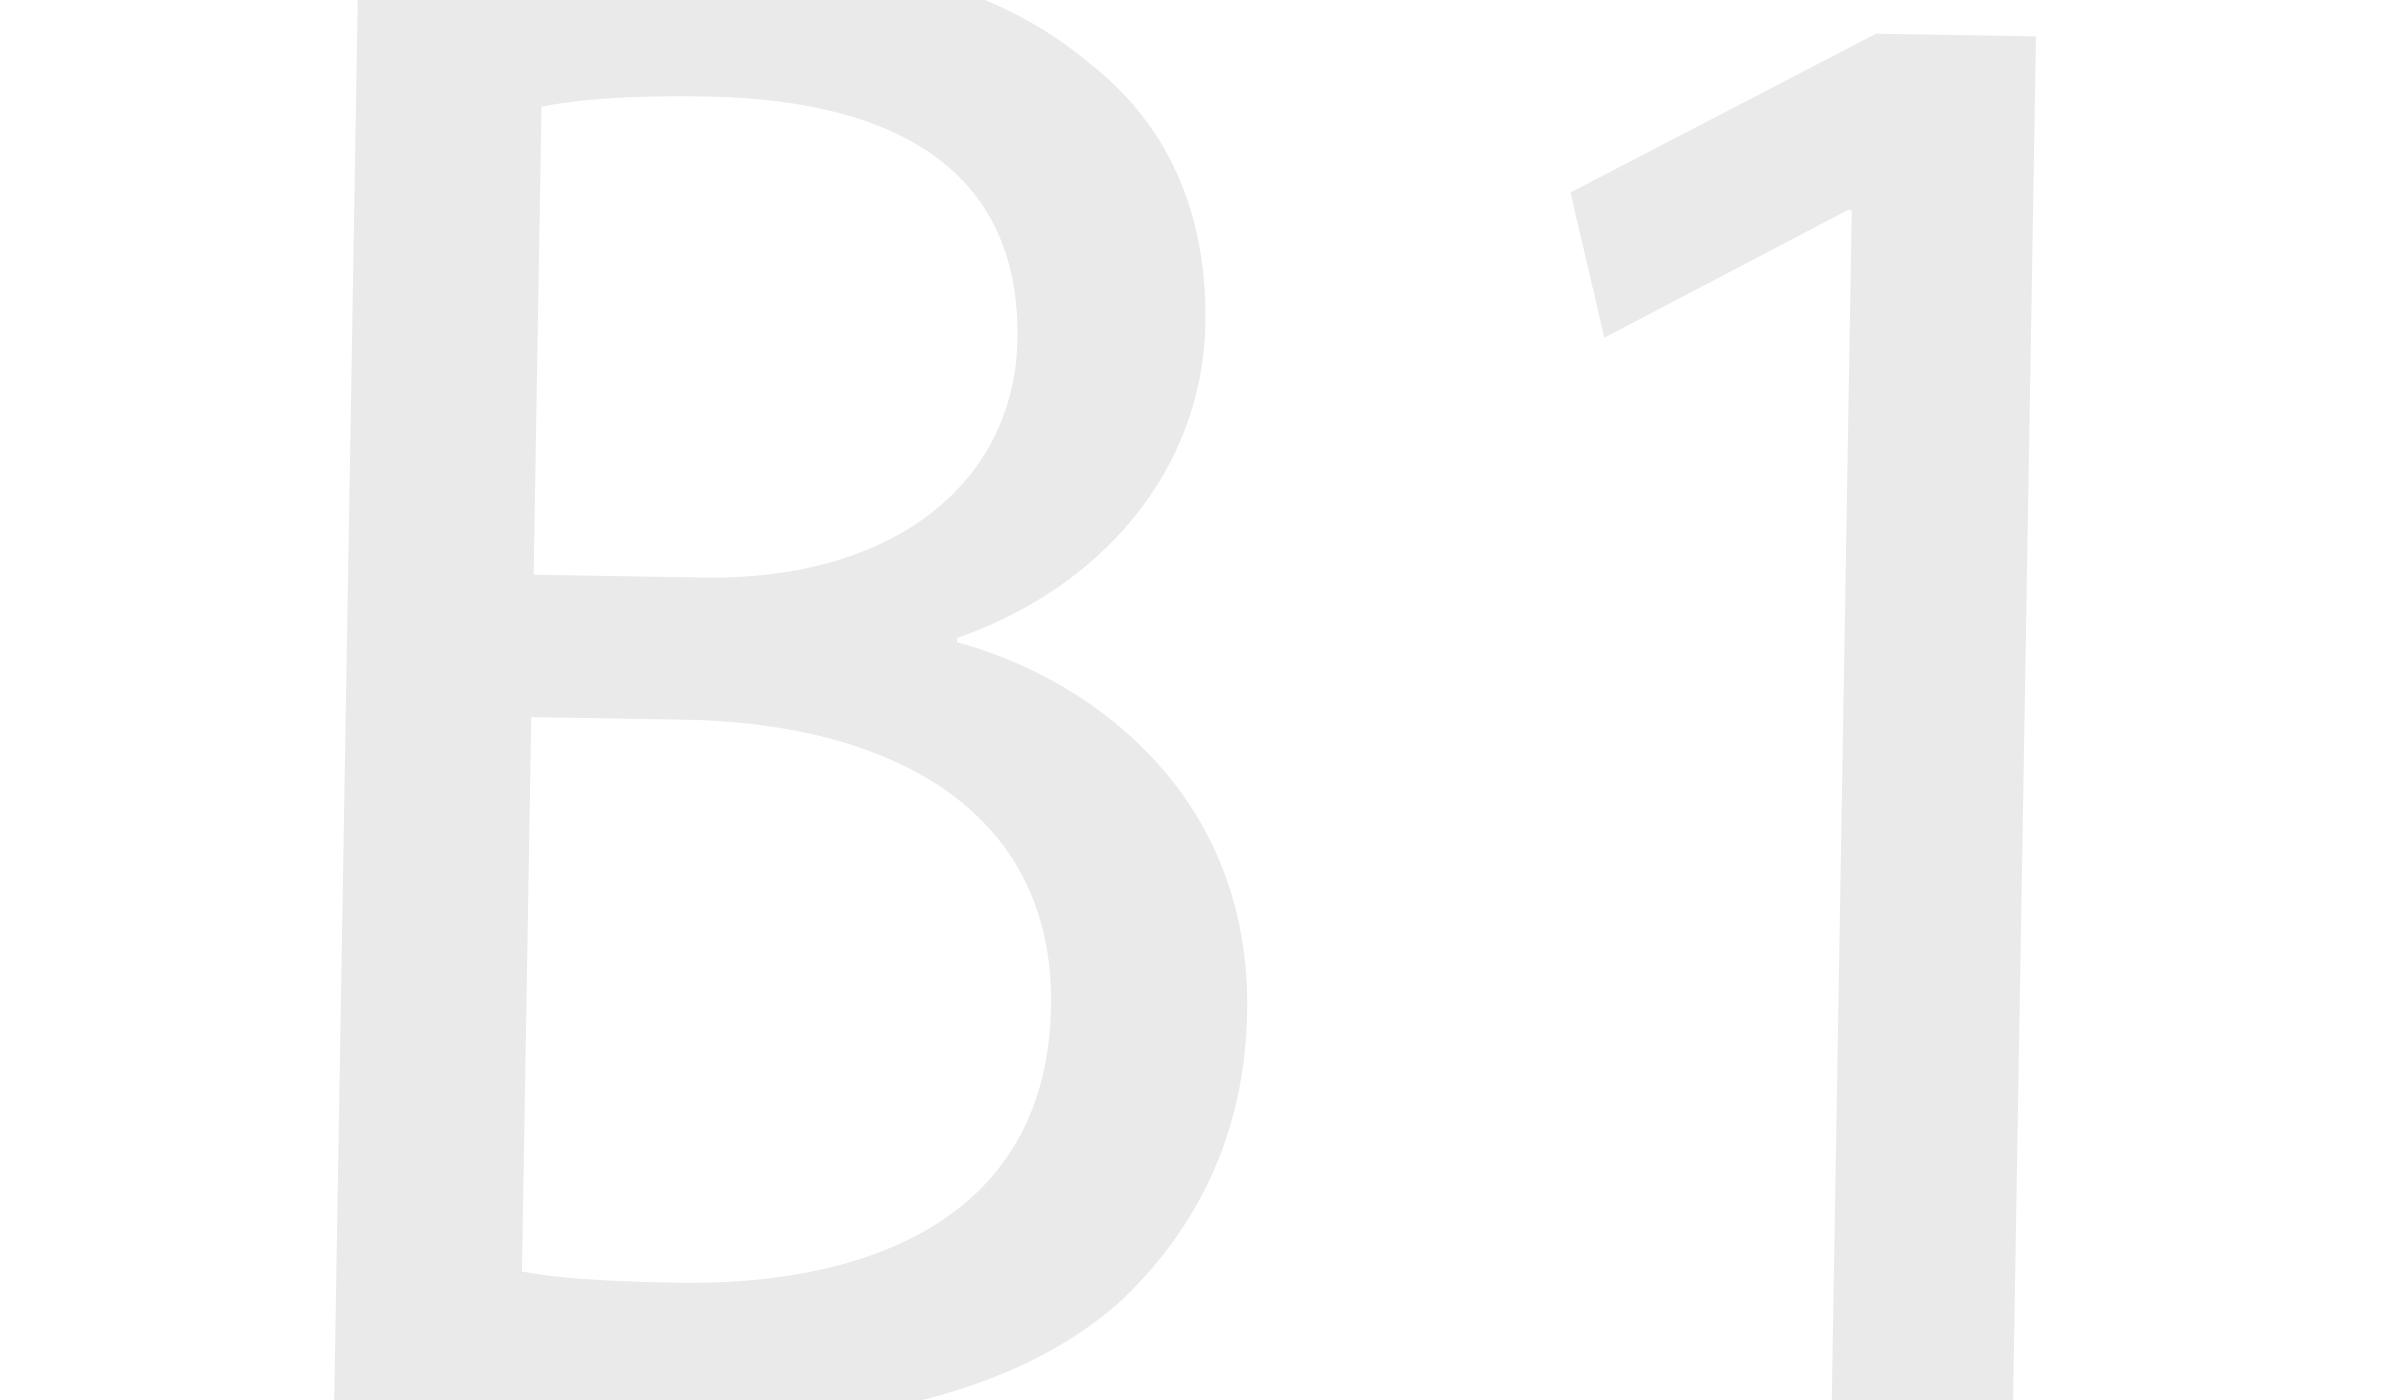 backb1